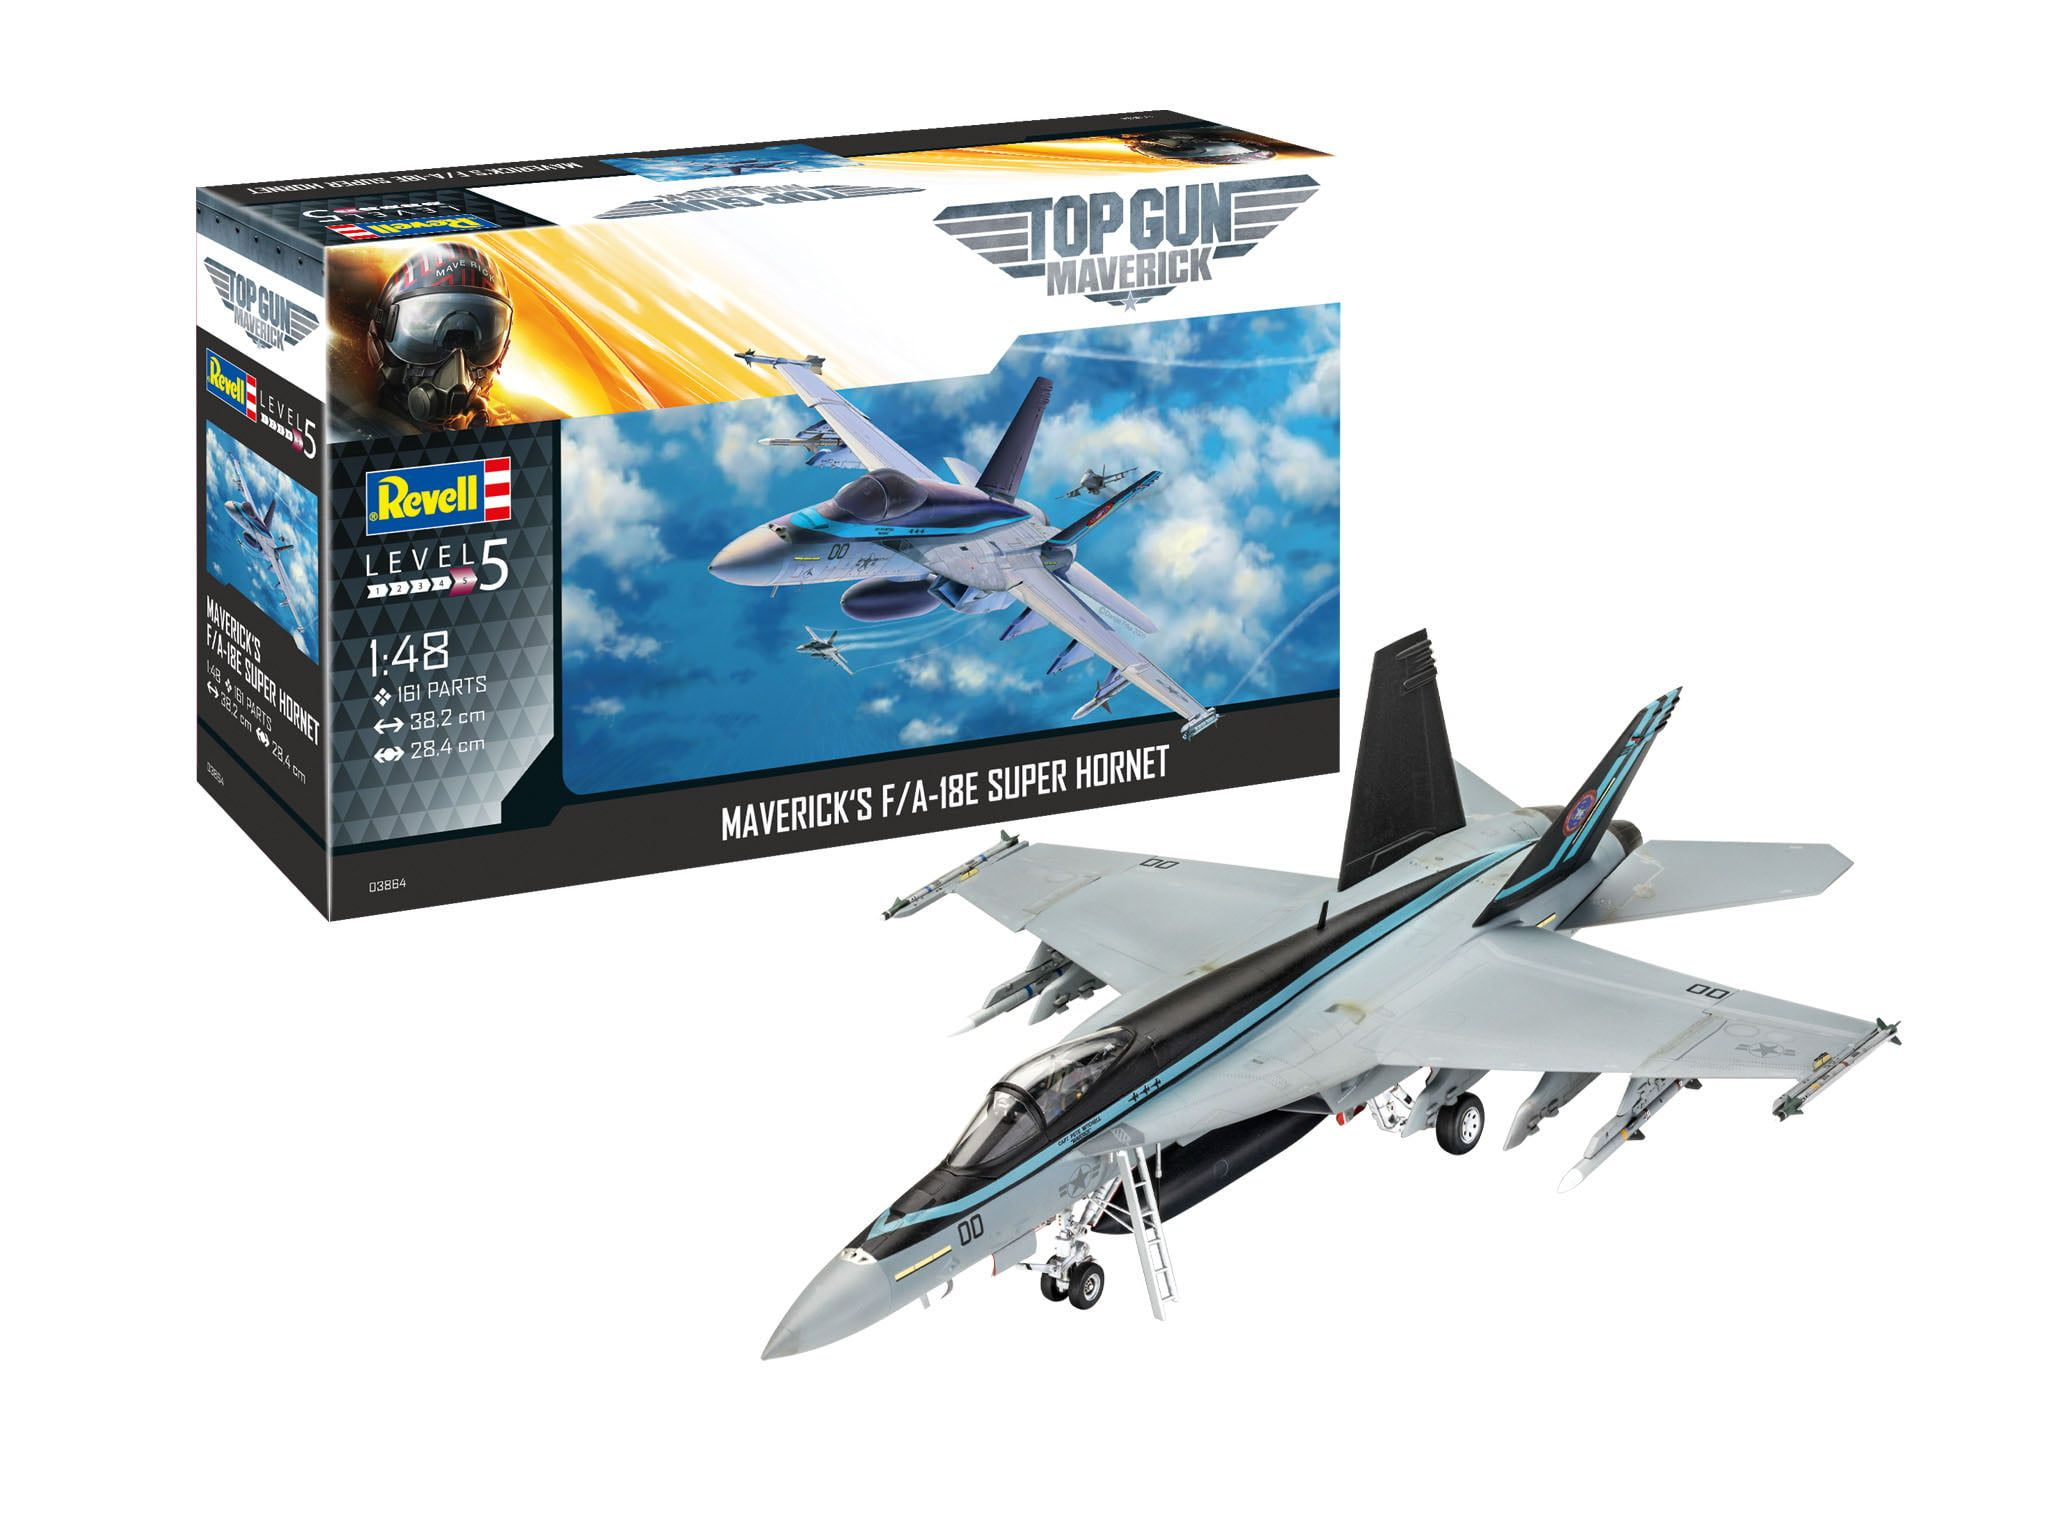 Revell Top Gun Maverick FA-18E Super Hornet